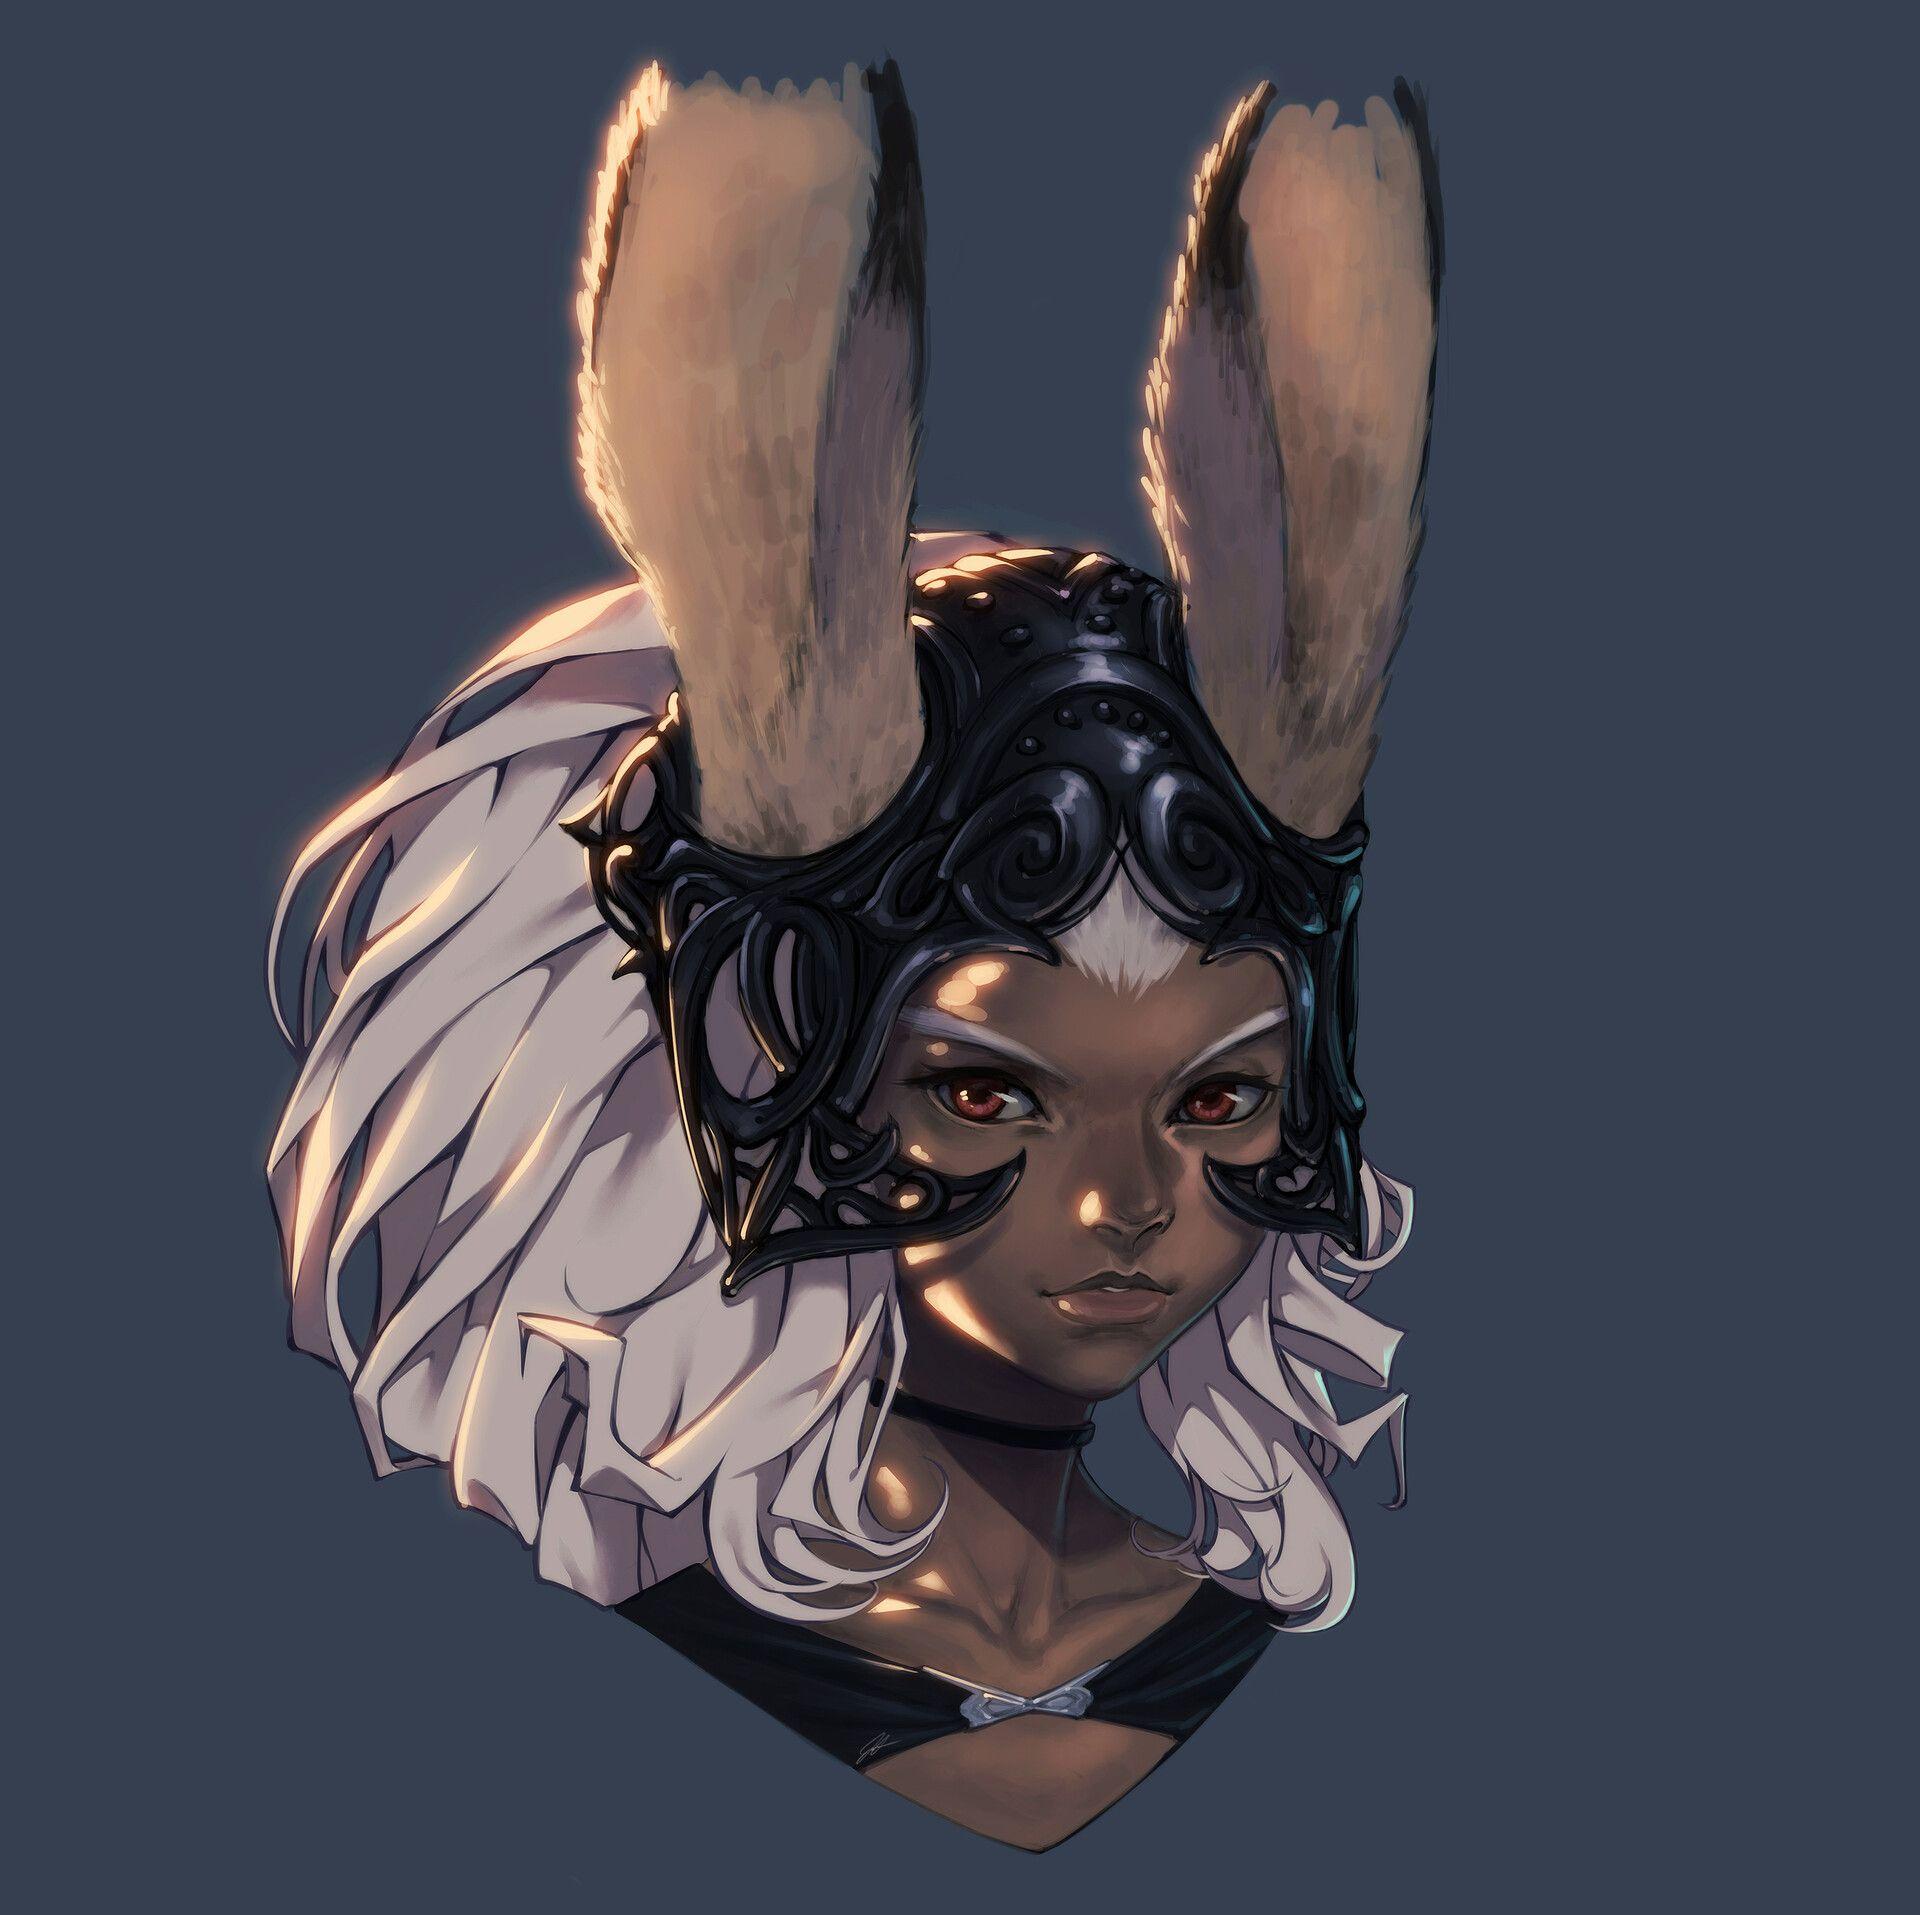 Final Fantasy XII Fran by ch-peralta on DeviantArt